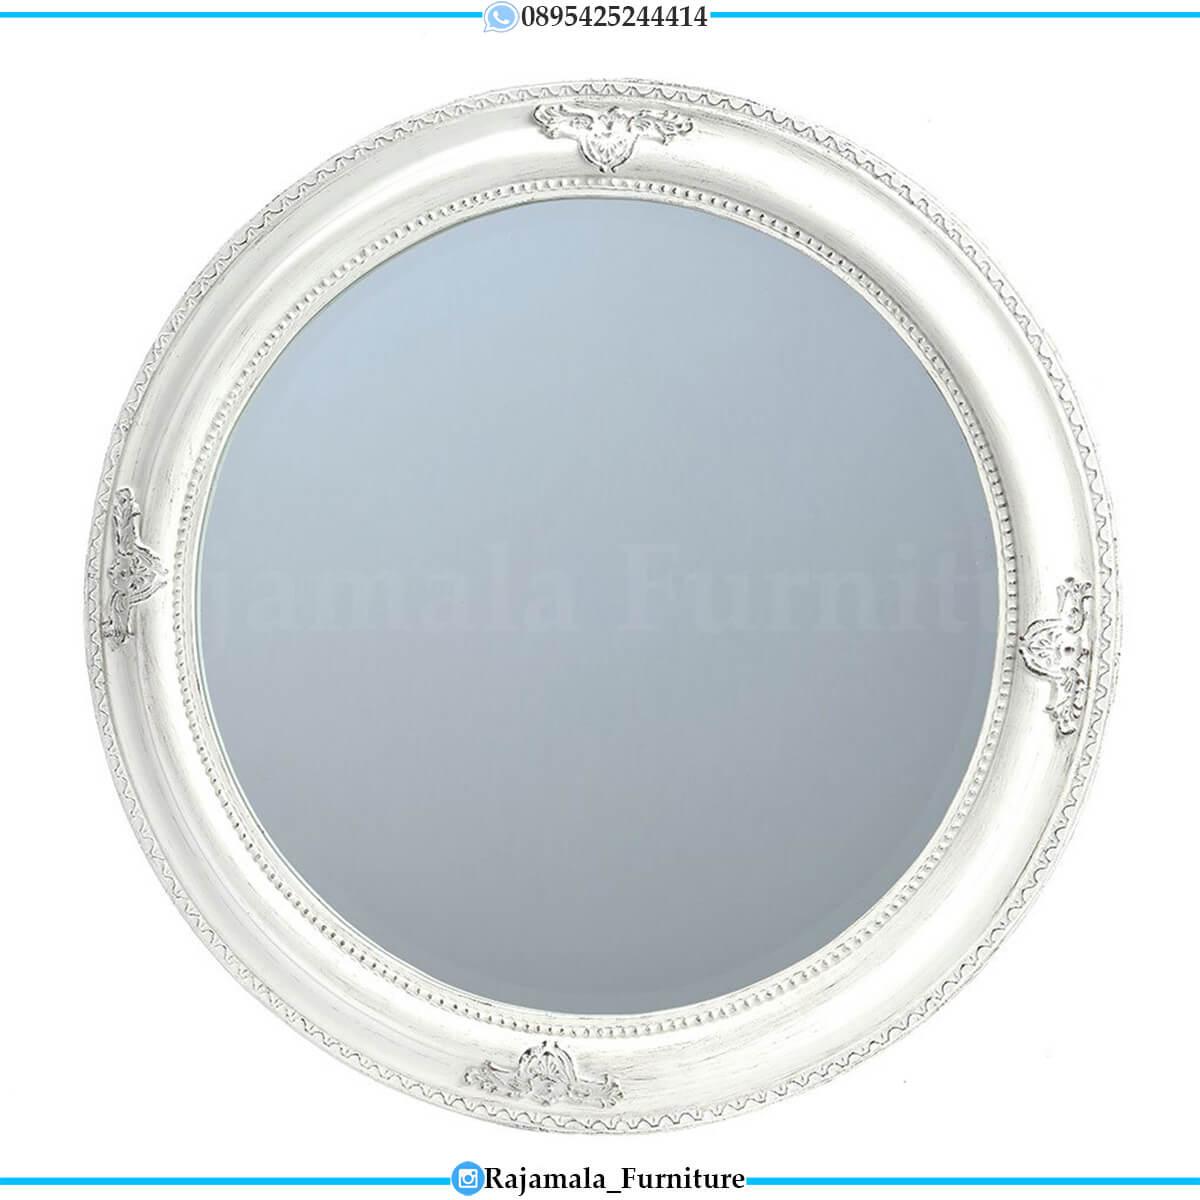 Harga Cermin Hias Mewah Bundar Luxury Style New White Duco Color RM-0664